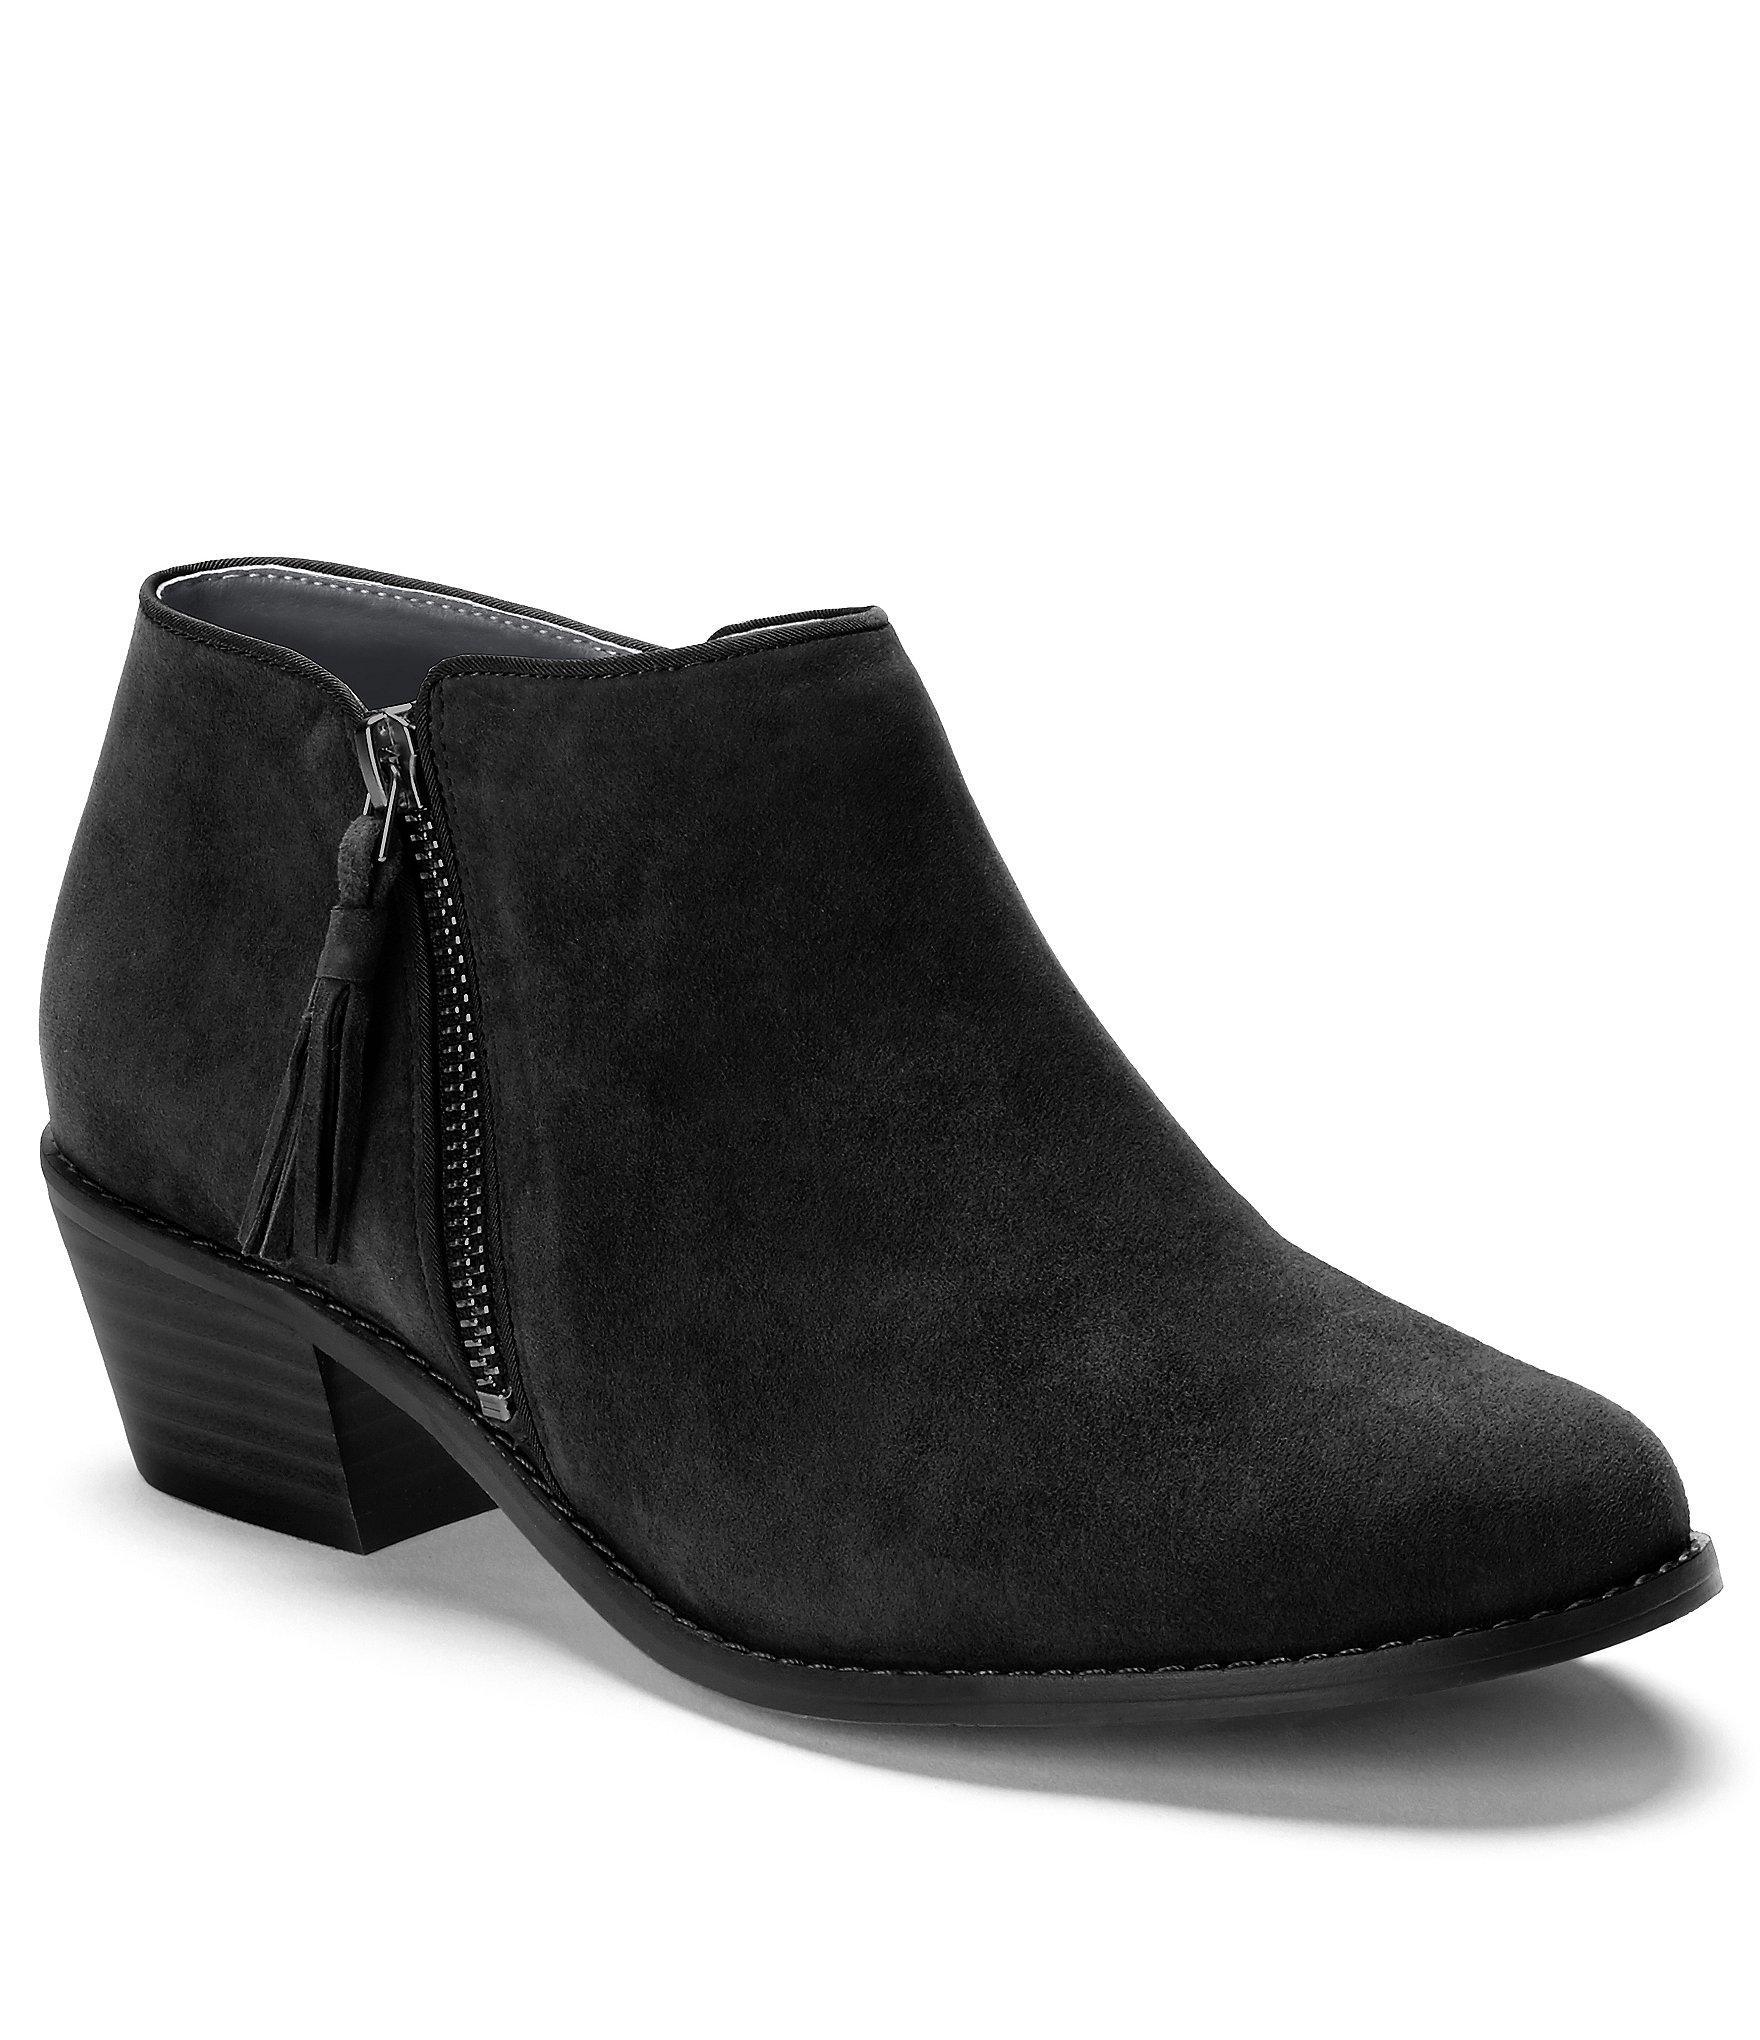 1e17749aa4b31 Vionic. Women's Black Serena Water Resistant Suede Zipper With Tassel Pull  Block Heel Ankle Boots